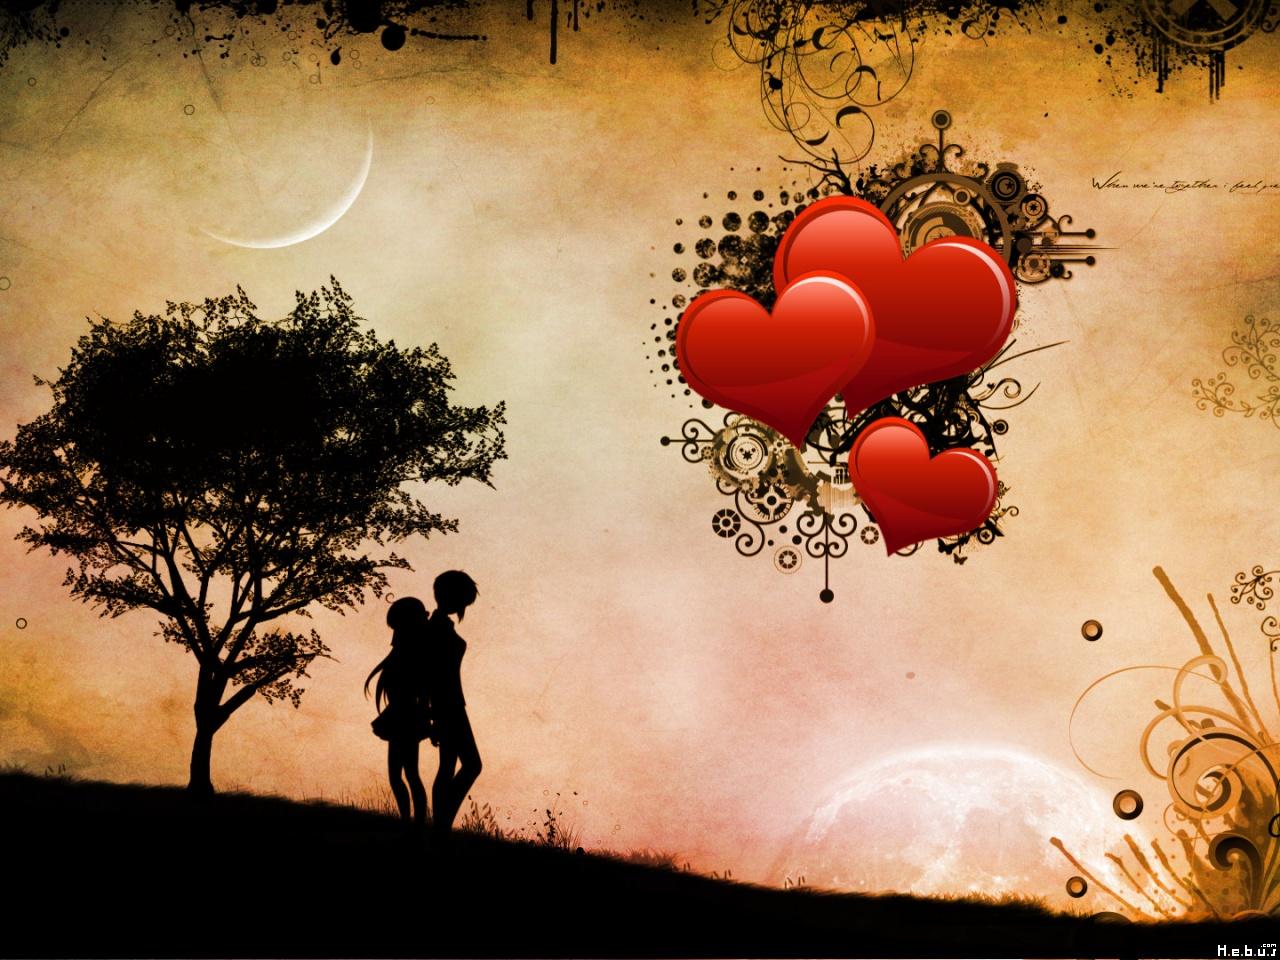 wallpaper hd love,heart,love,sky,valentine's day,romance